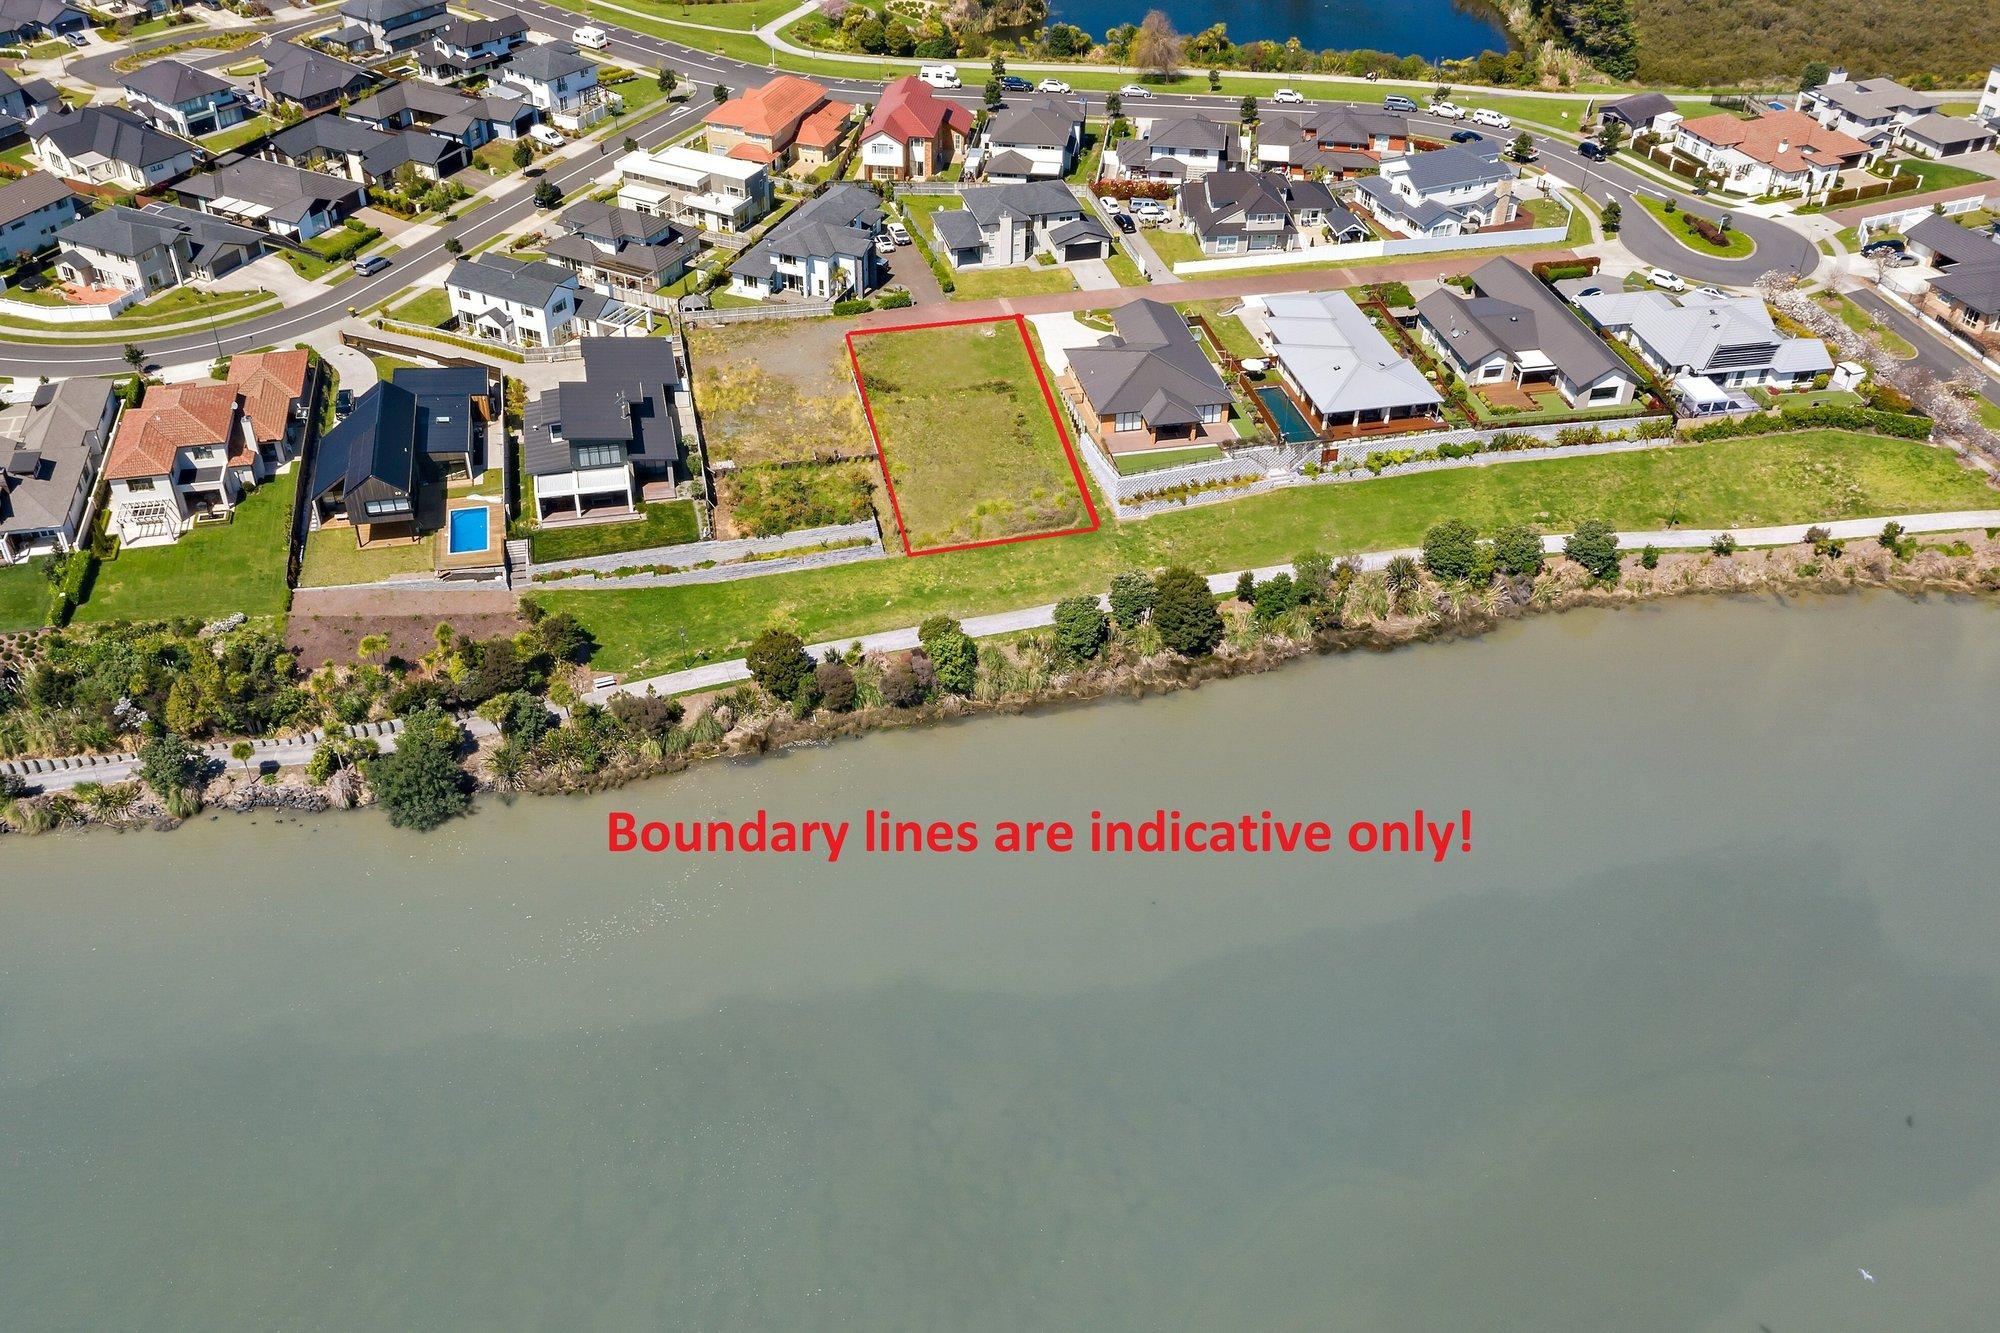 Land in Karaka, Auckland, New Zealand 1 - 11421919